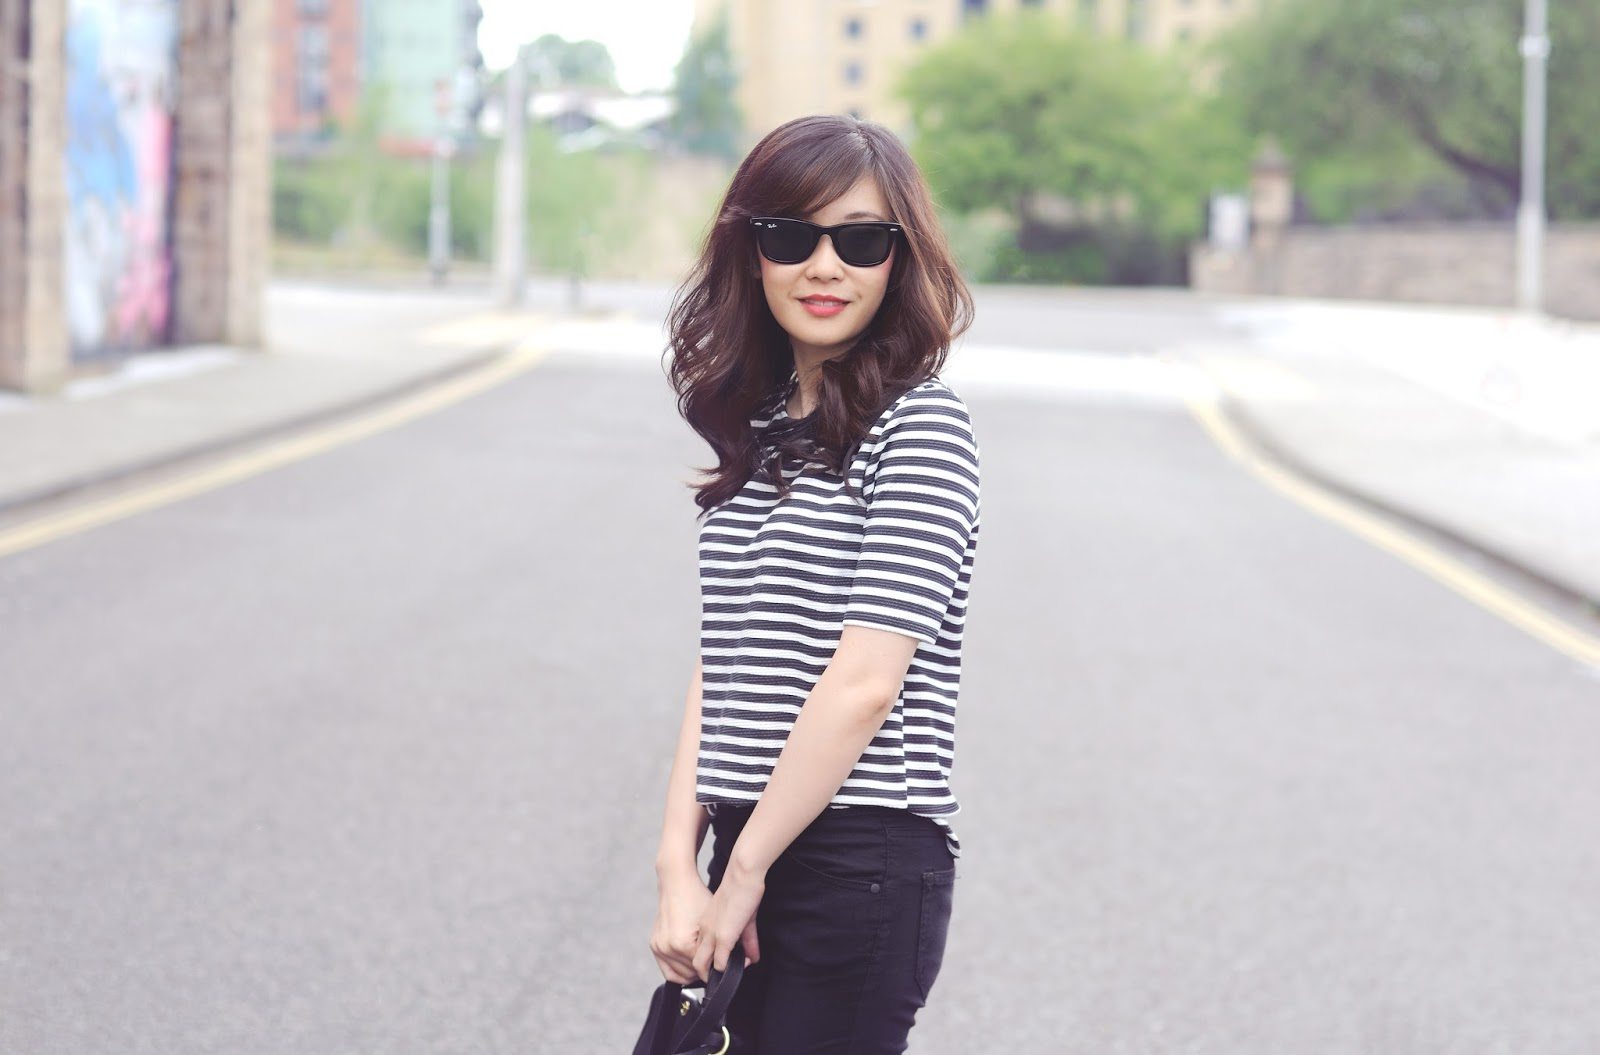 wearing monocrhome in summer, breton striped top